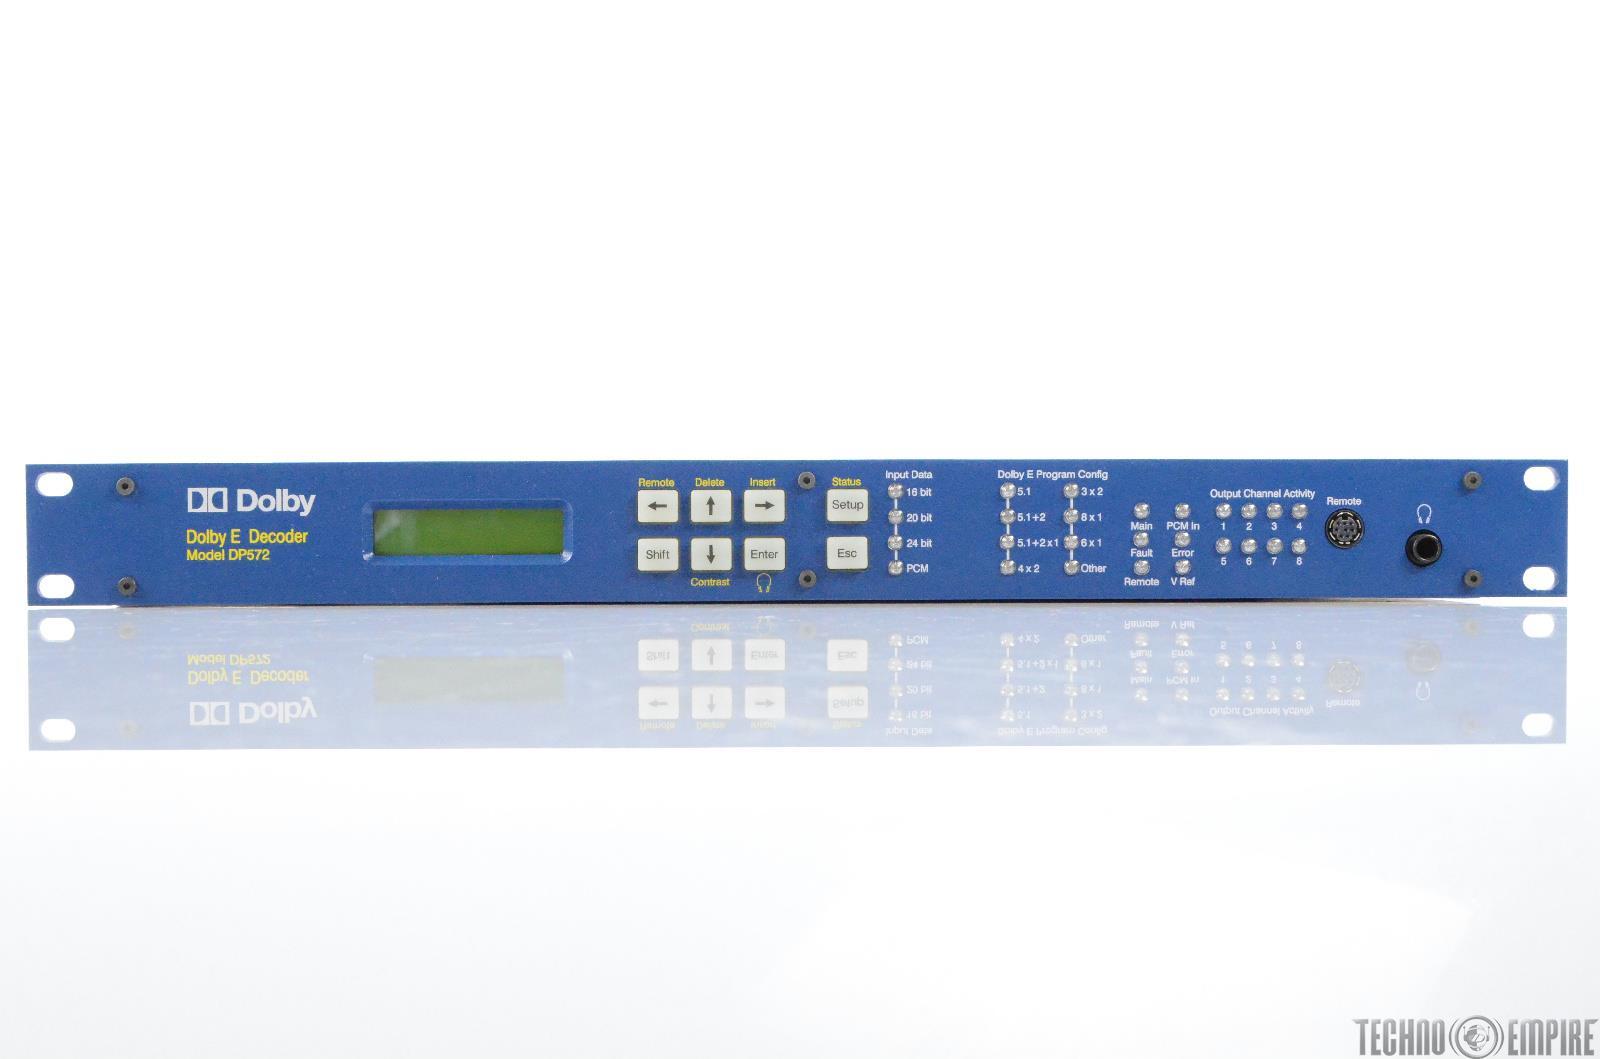 Dolby E Decoder Model DP572 #29485